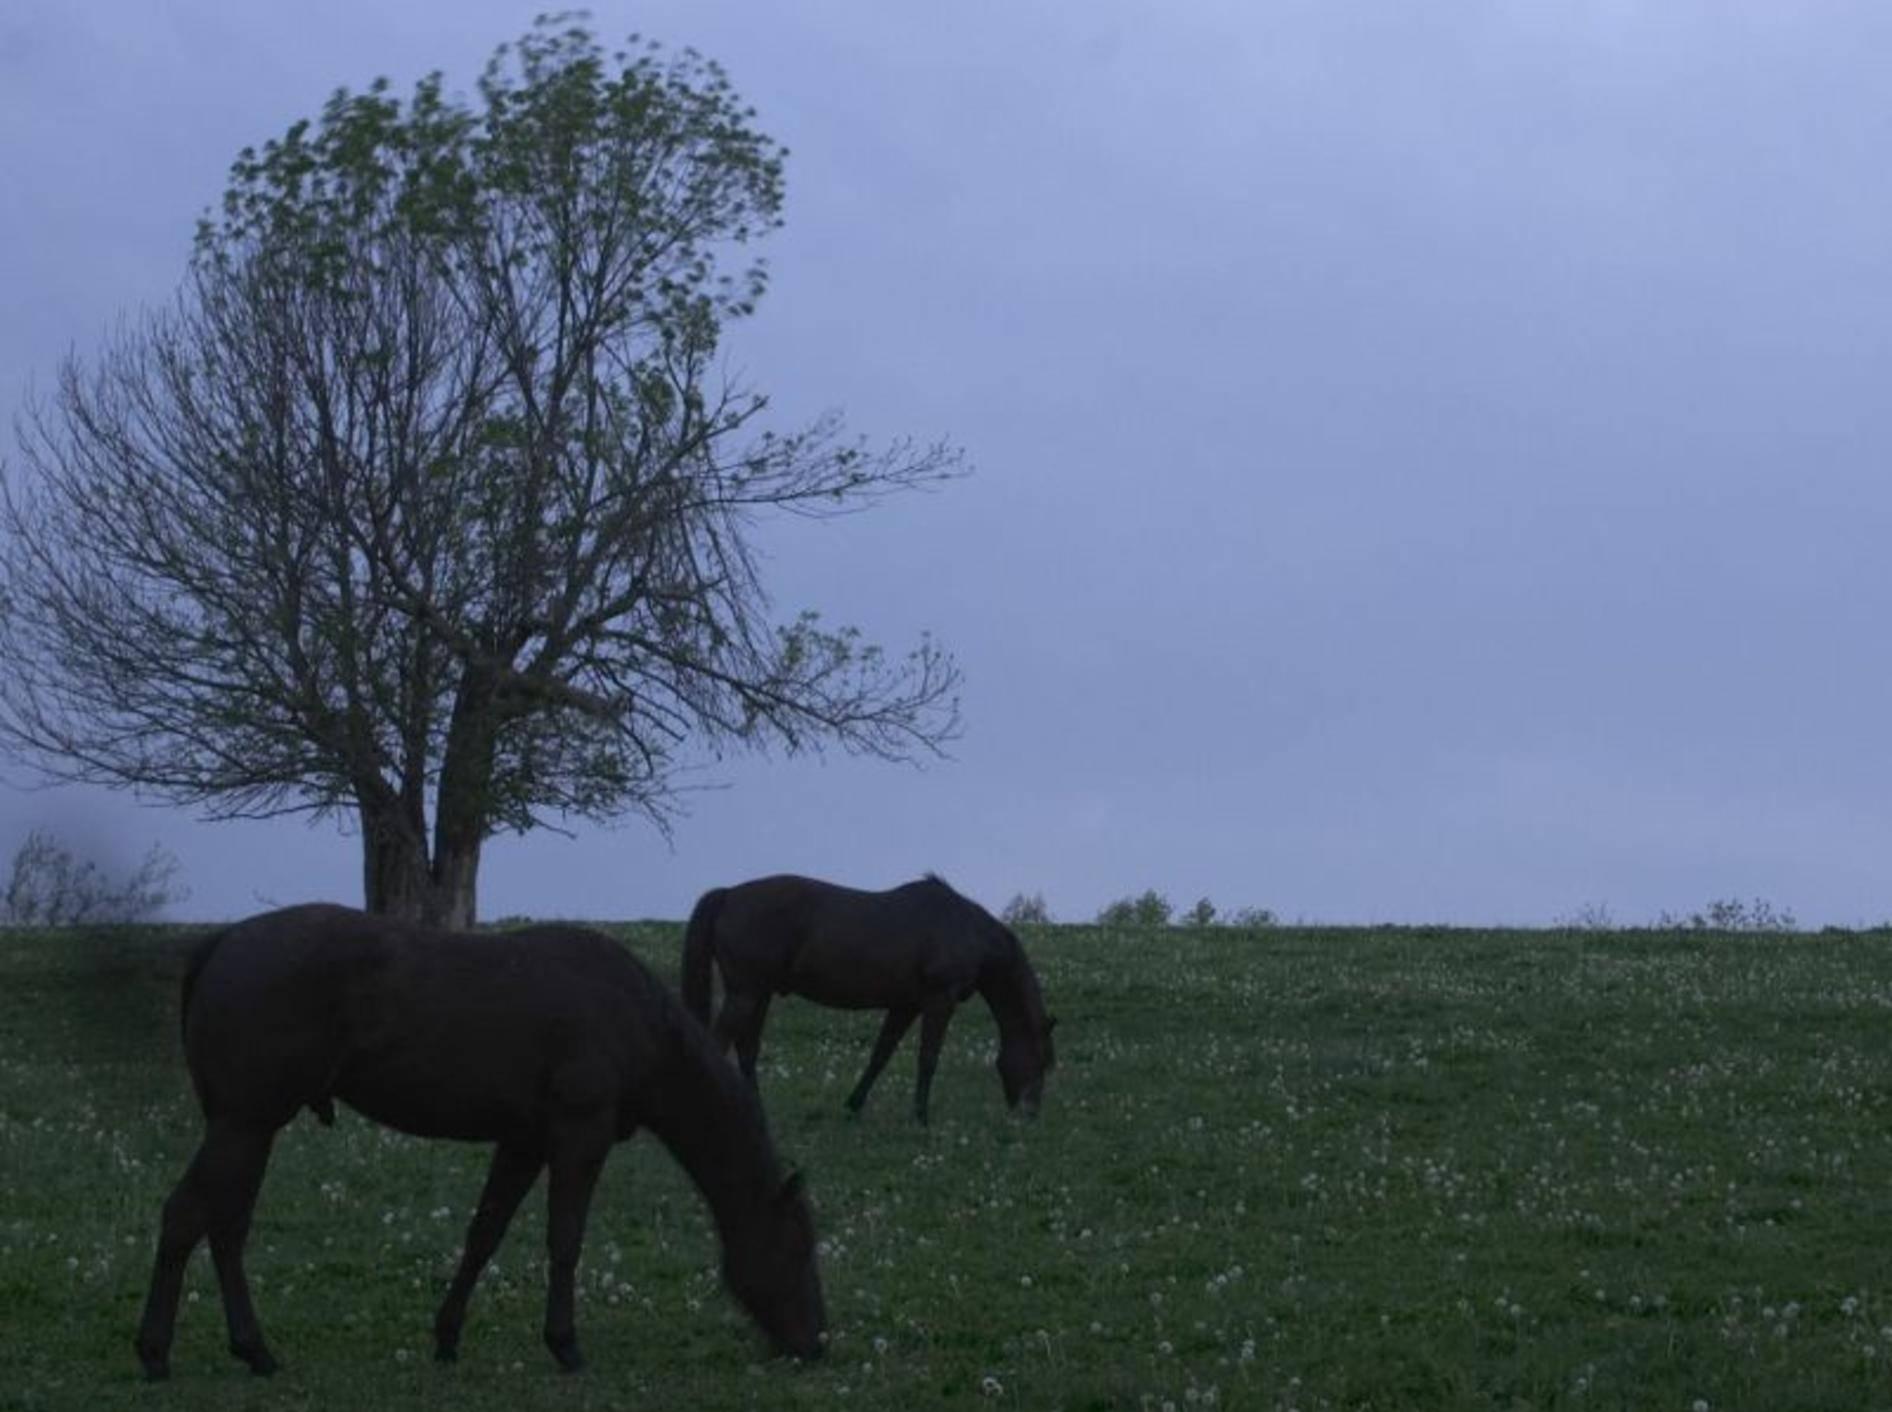 Tierquäler schießt in Jena auf Pferde und Kühe — Bild: Shutterstock / Robert C. Tussey III